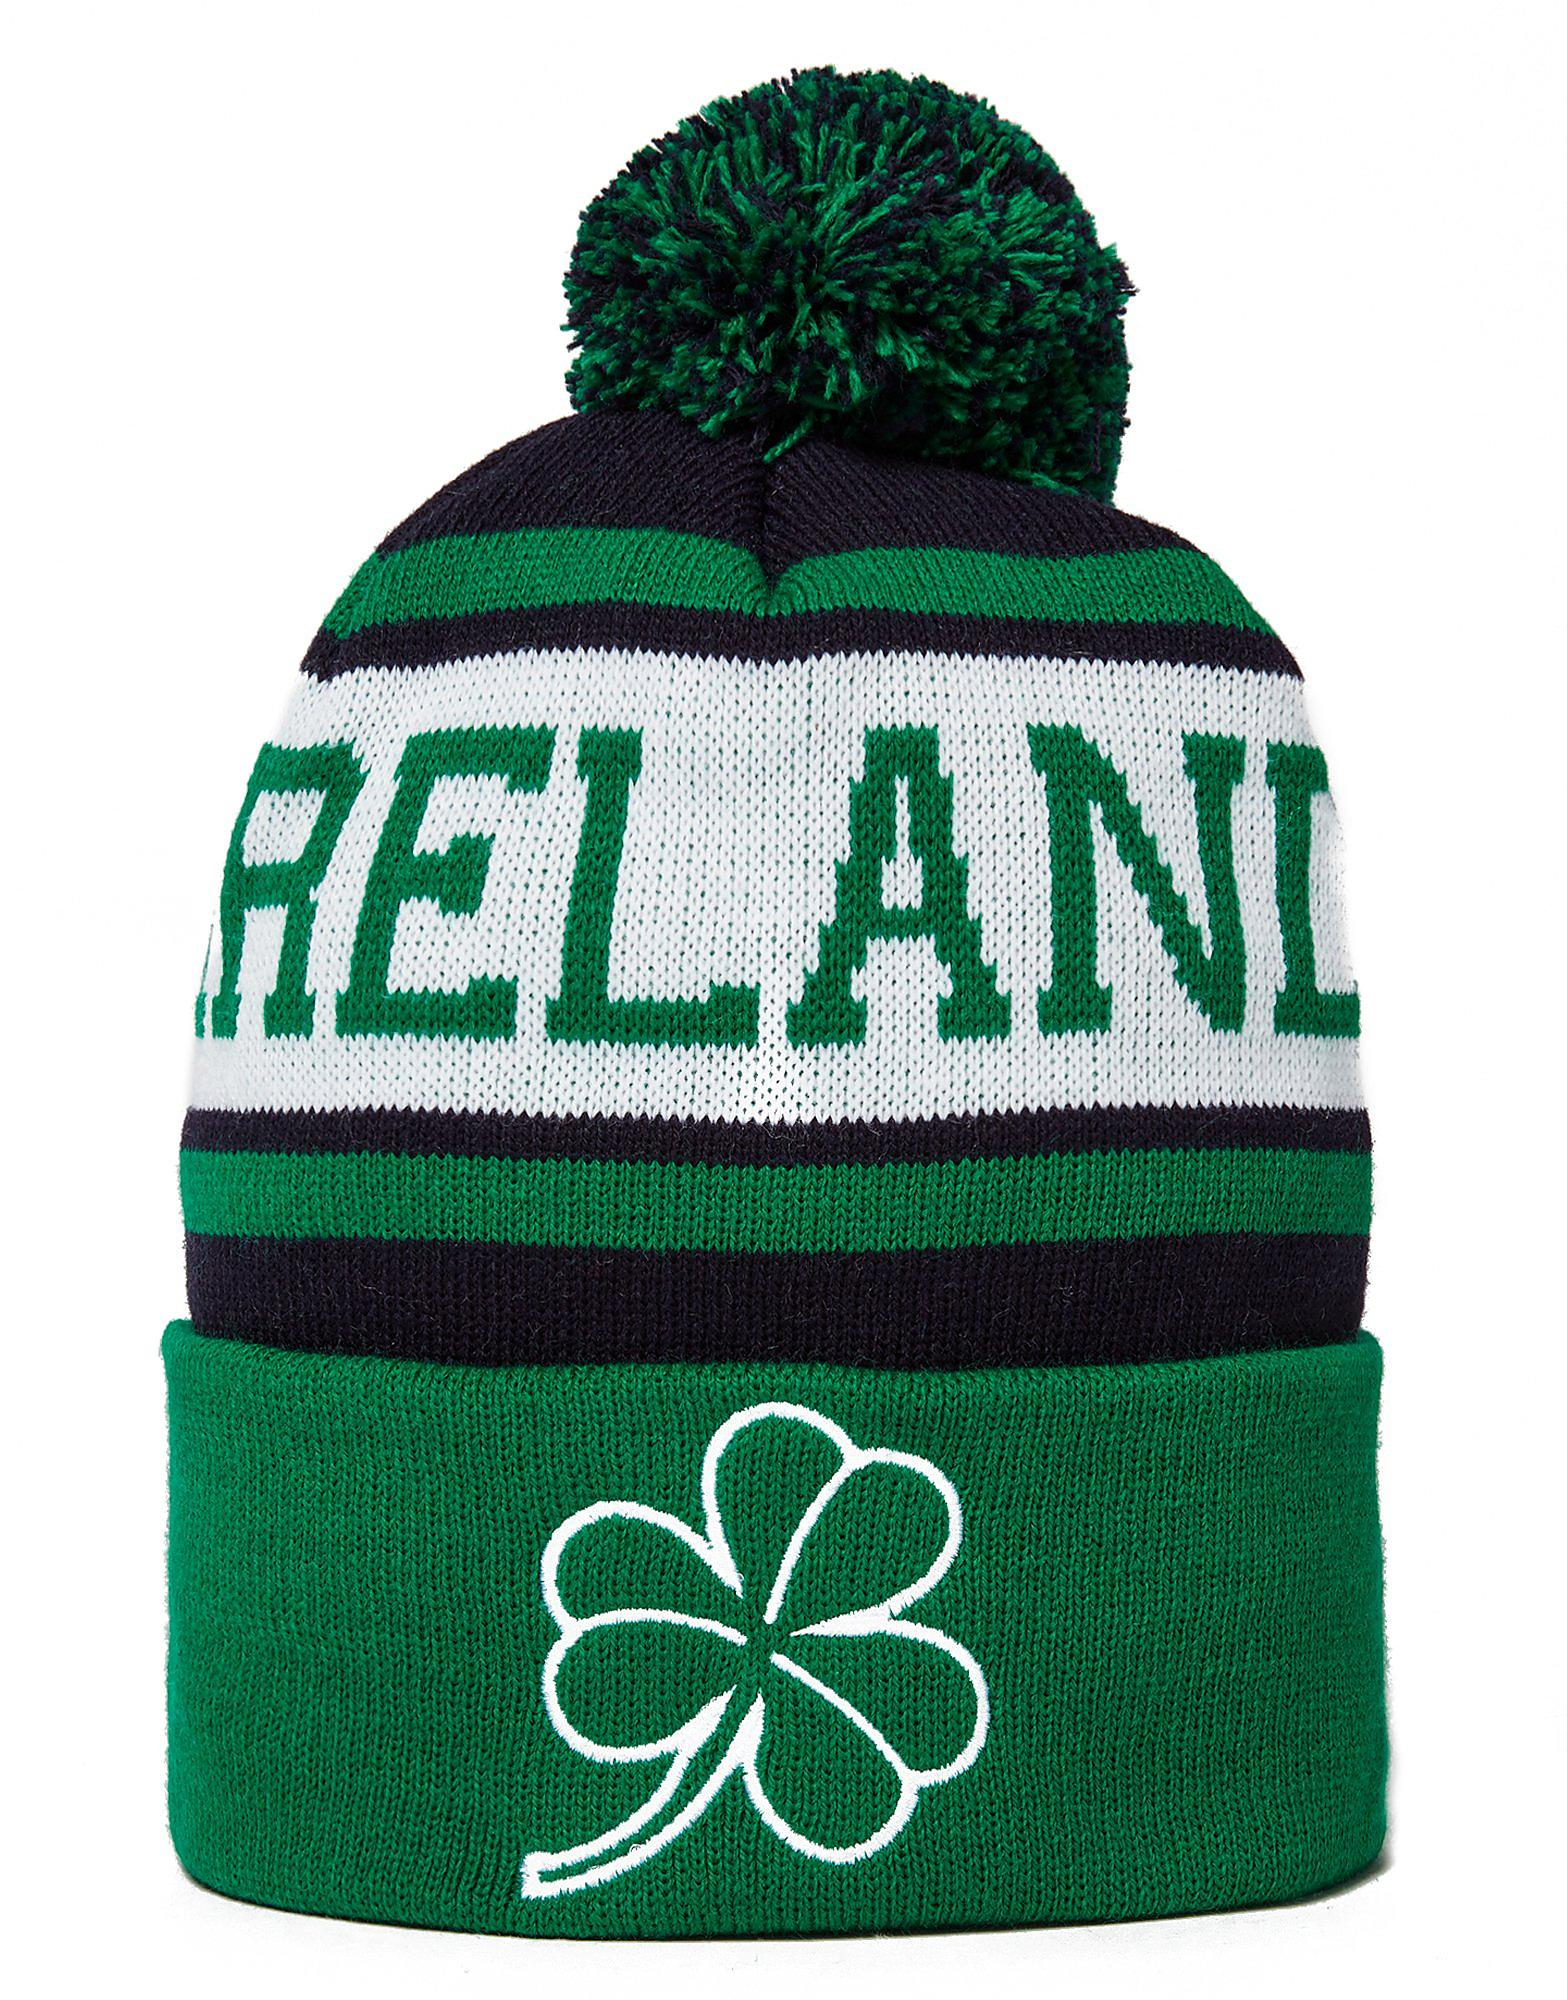 Official Team Ireland Beanie